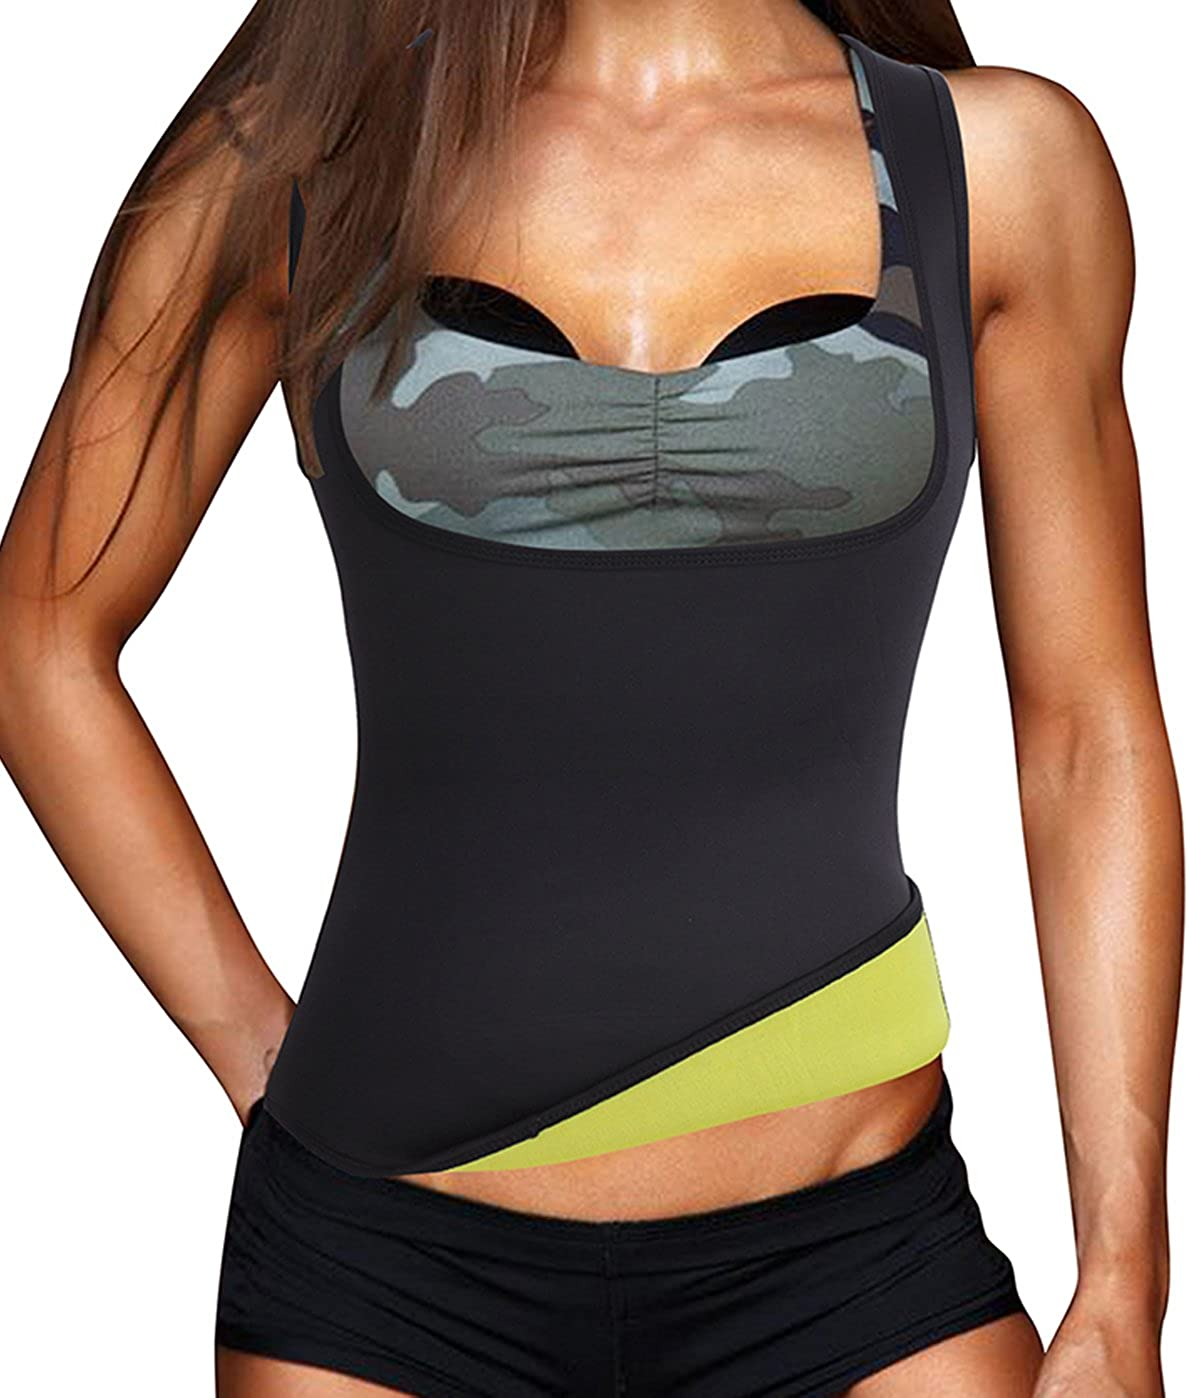 TrainingGirl Women Hot Slimming Sauna Sweat Vest Neoprene Body Shaper for Weight Loss Tummy Fat Burner Workout Tank Tops